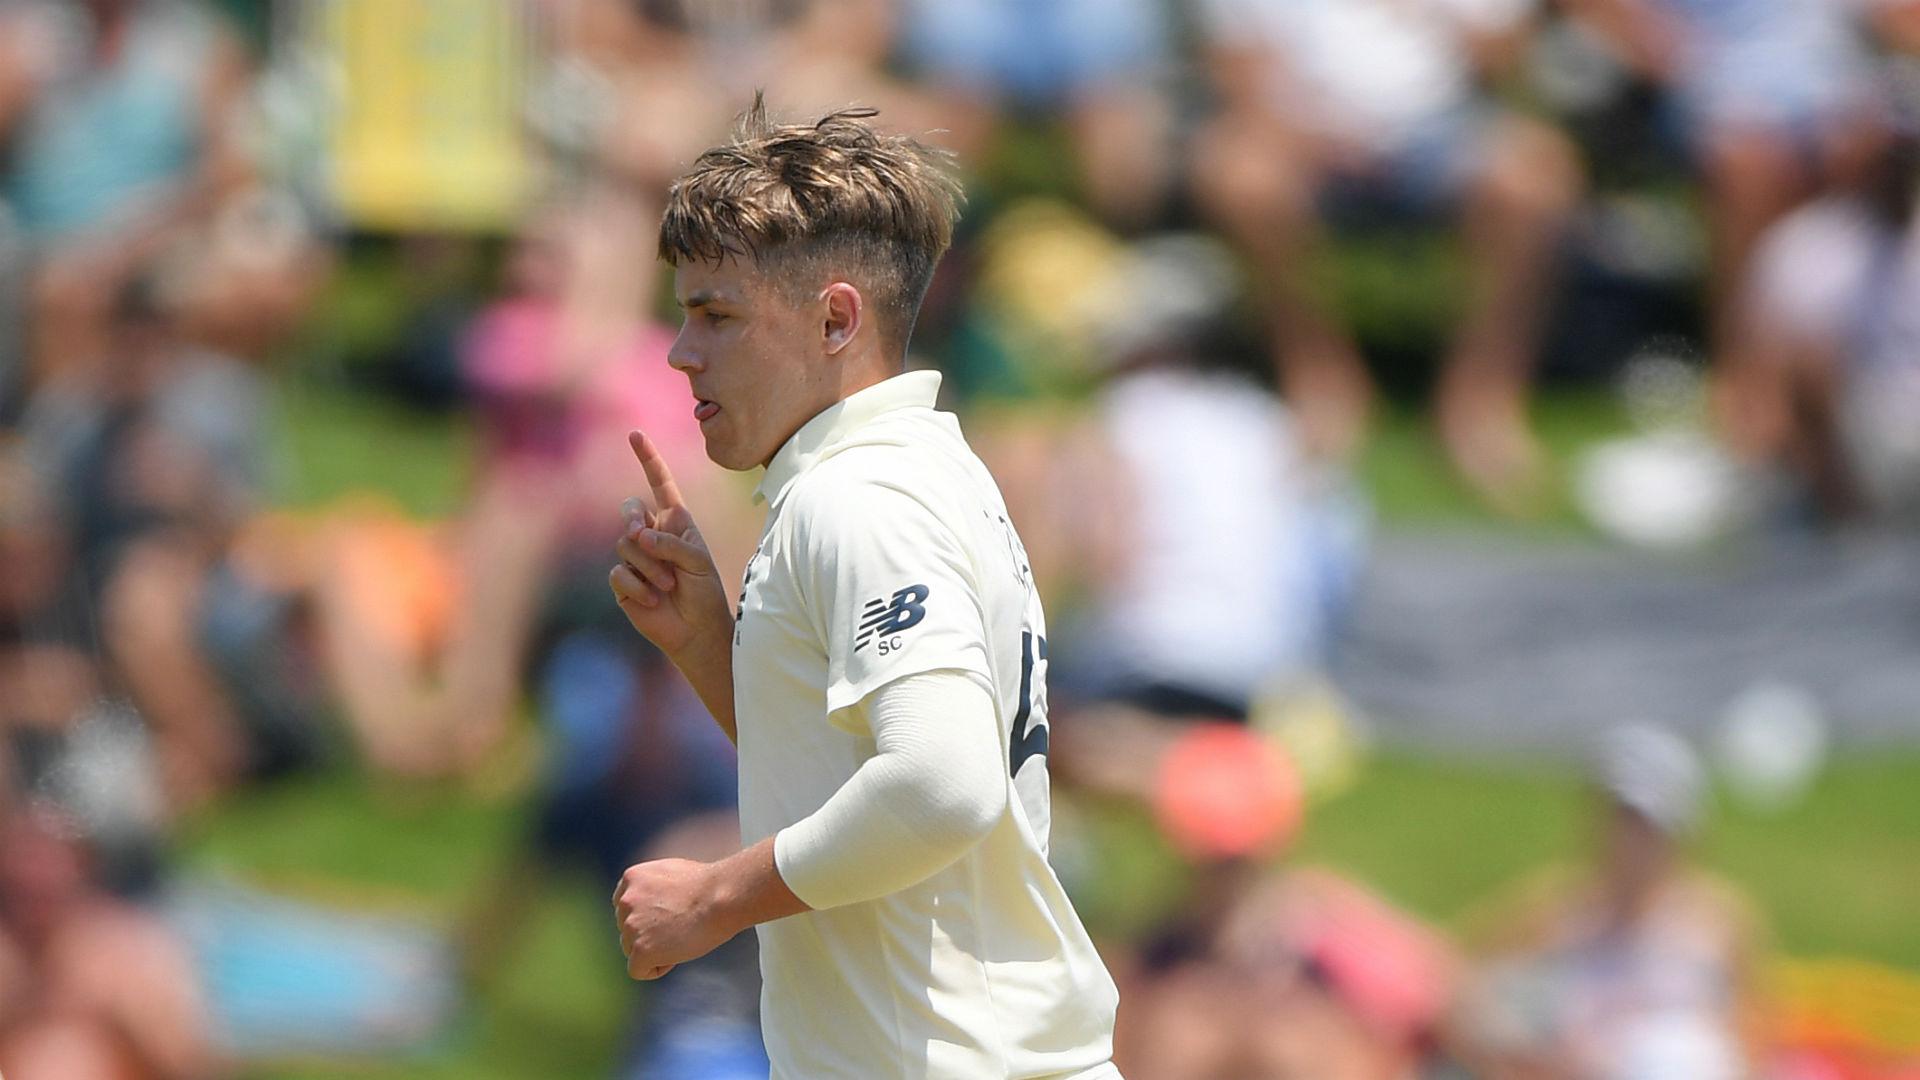 England let De Kock get away, but Curran sees plenty of positives